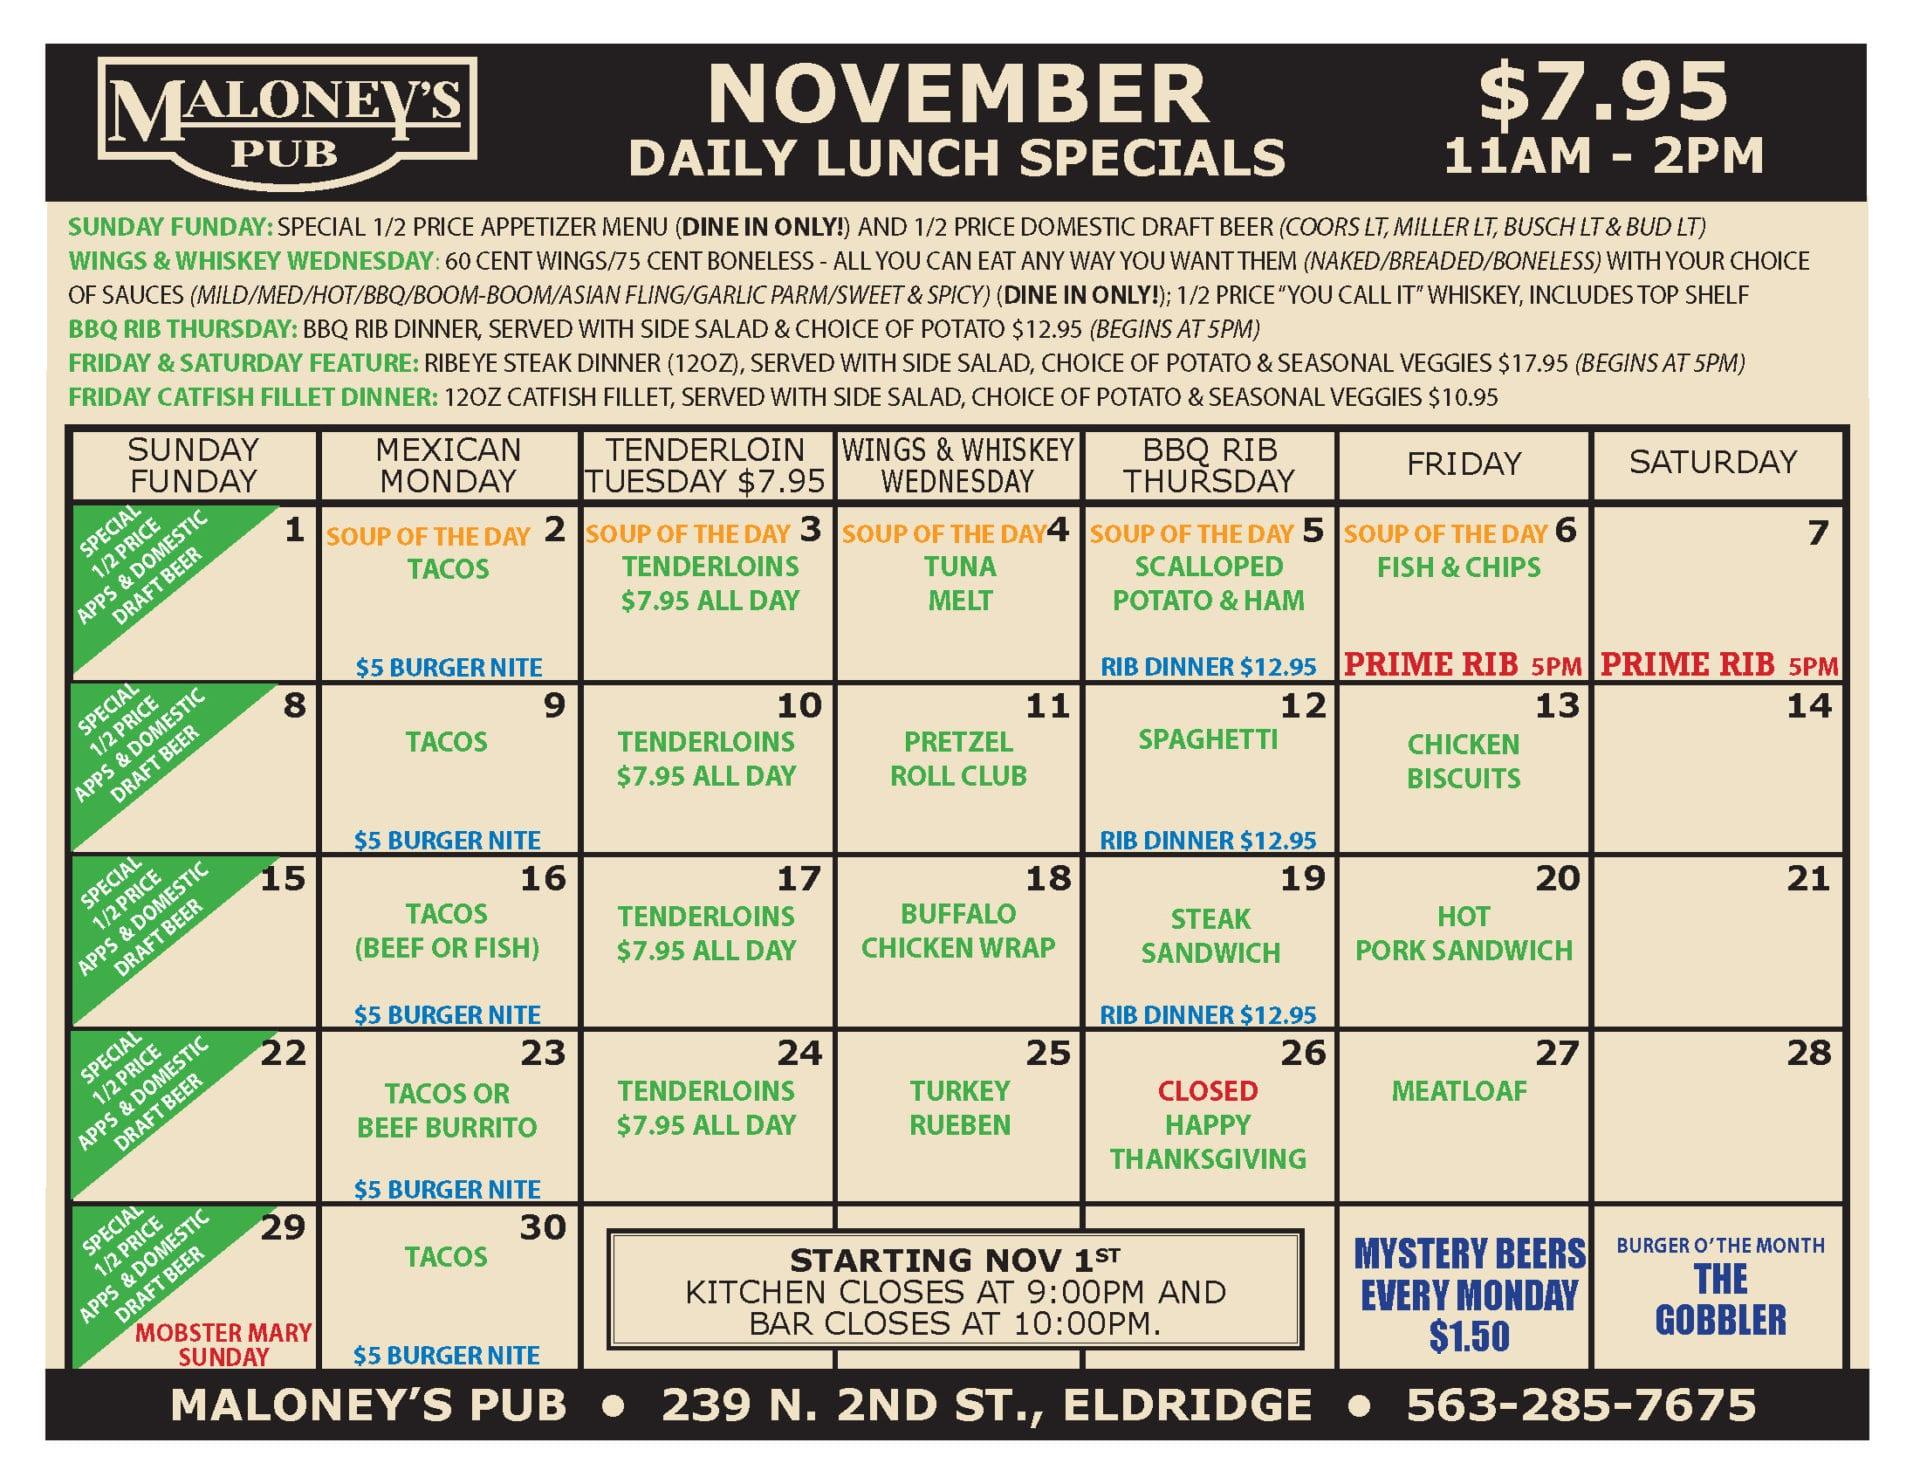 Maloney's Pub November Lunch Specials